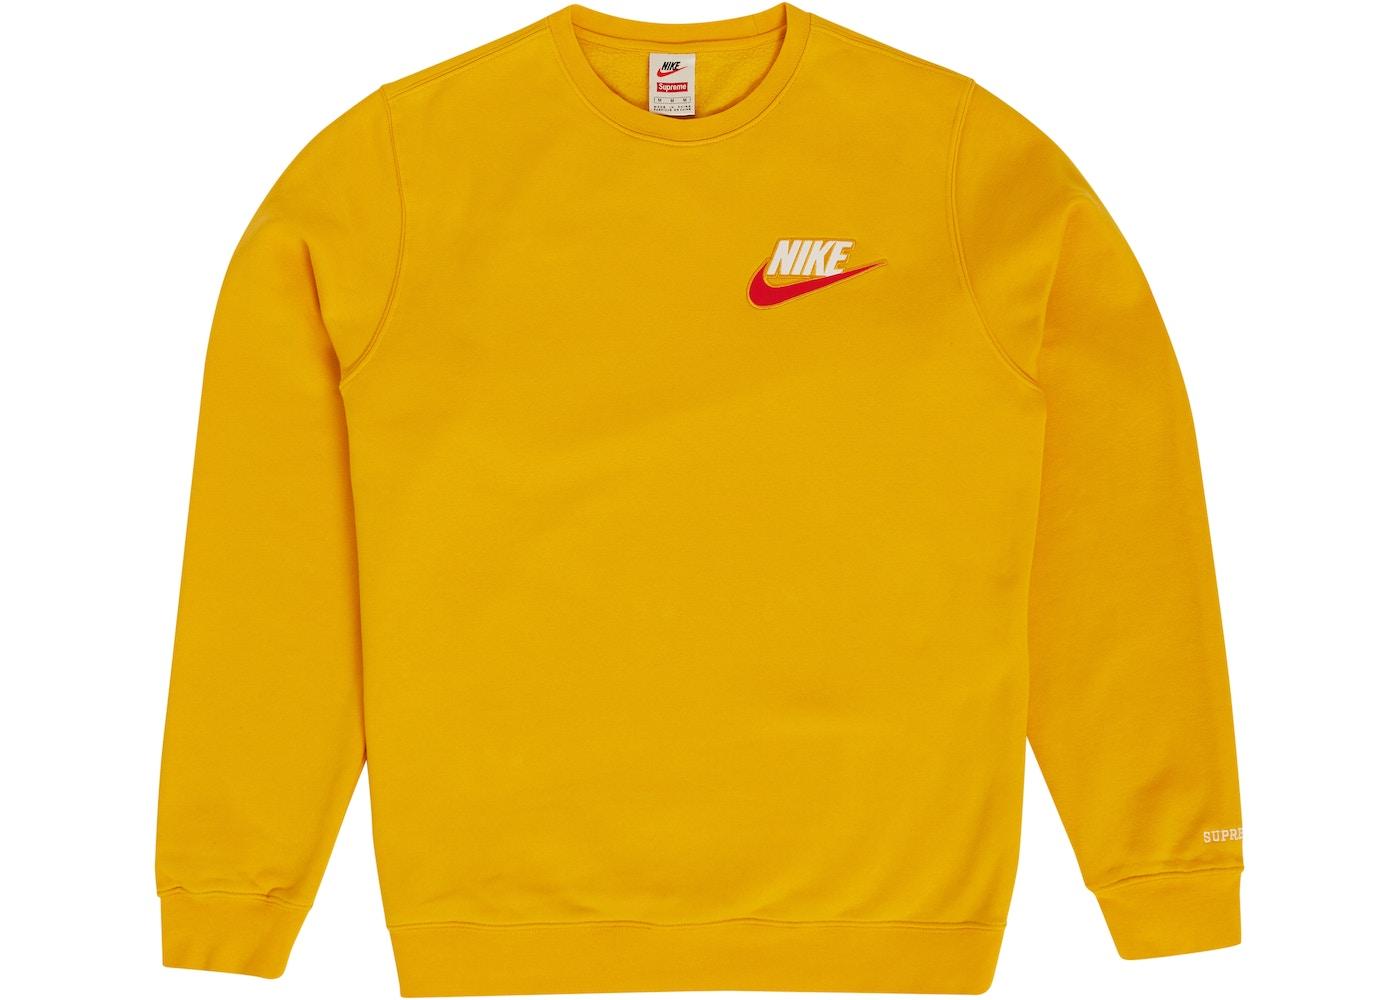 0b5eba20e Supreme Nike Crewneck Mustard - FW18